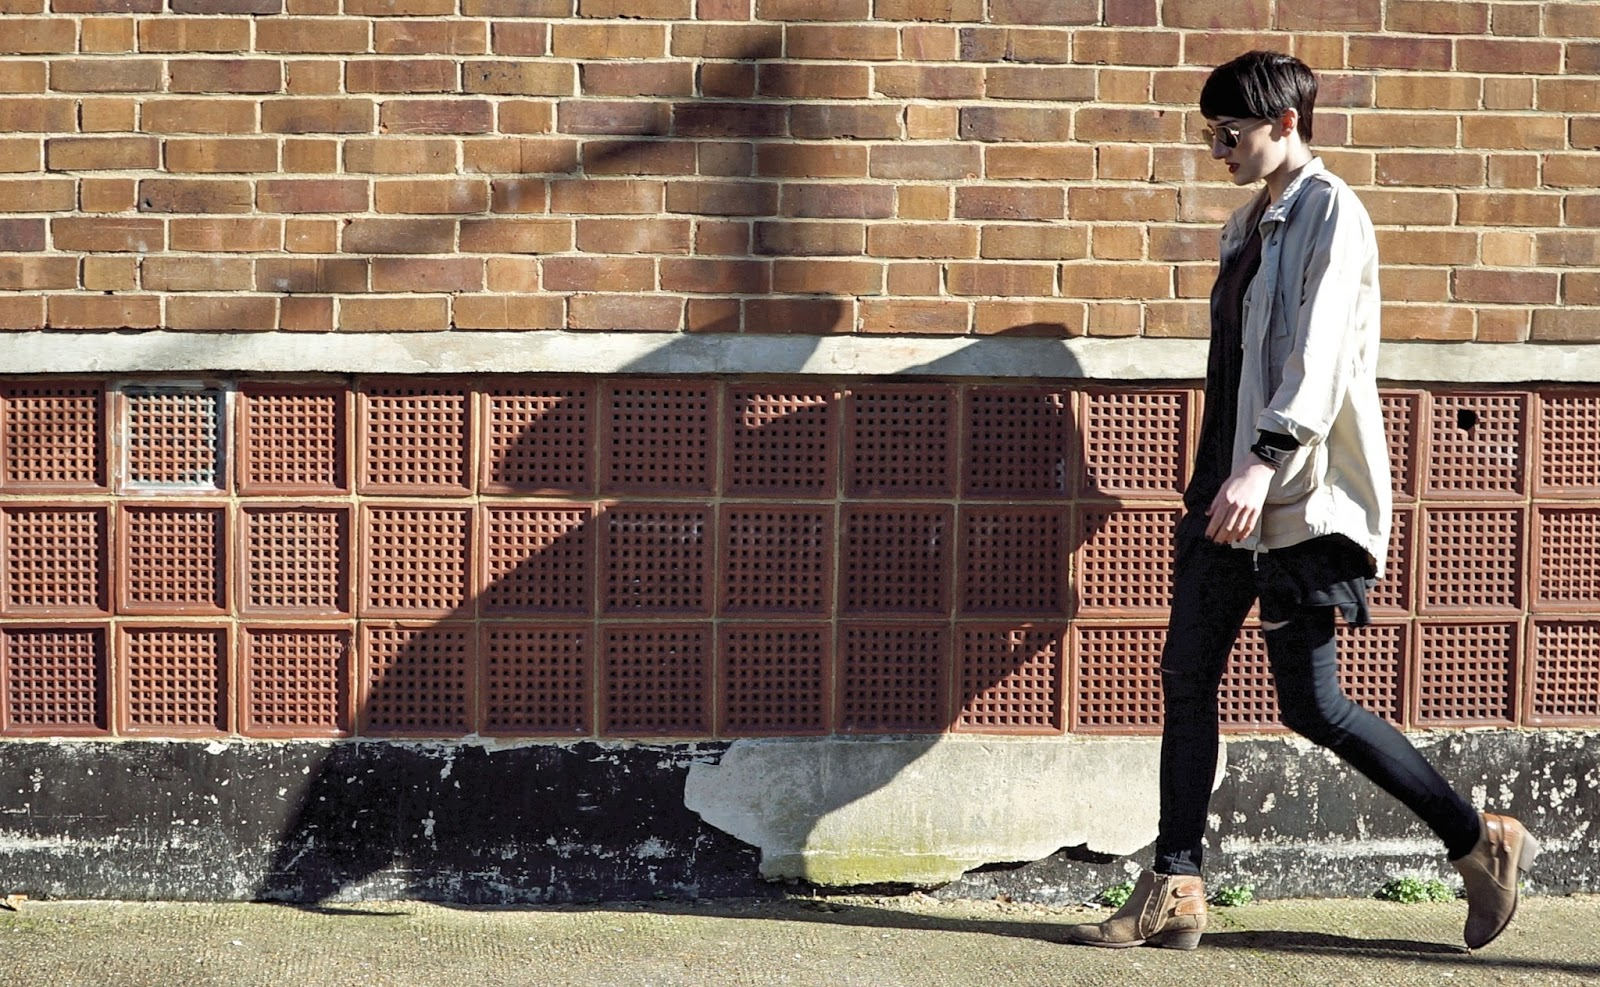 4ºC a l'ombre Outfit London Monkie jacket, Primark slim jeans, Hudson boots, Rayban sunglasses, Brandy Melville t-shirt lexieblush.com